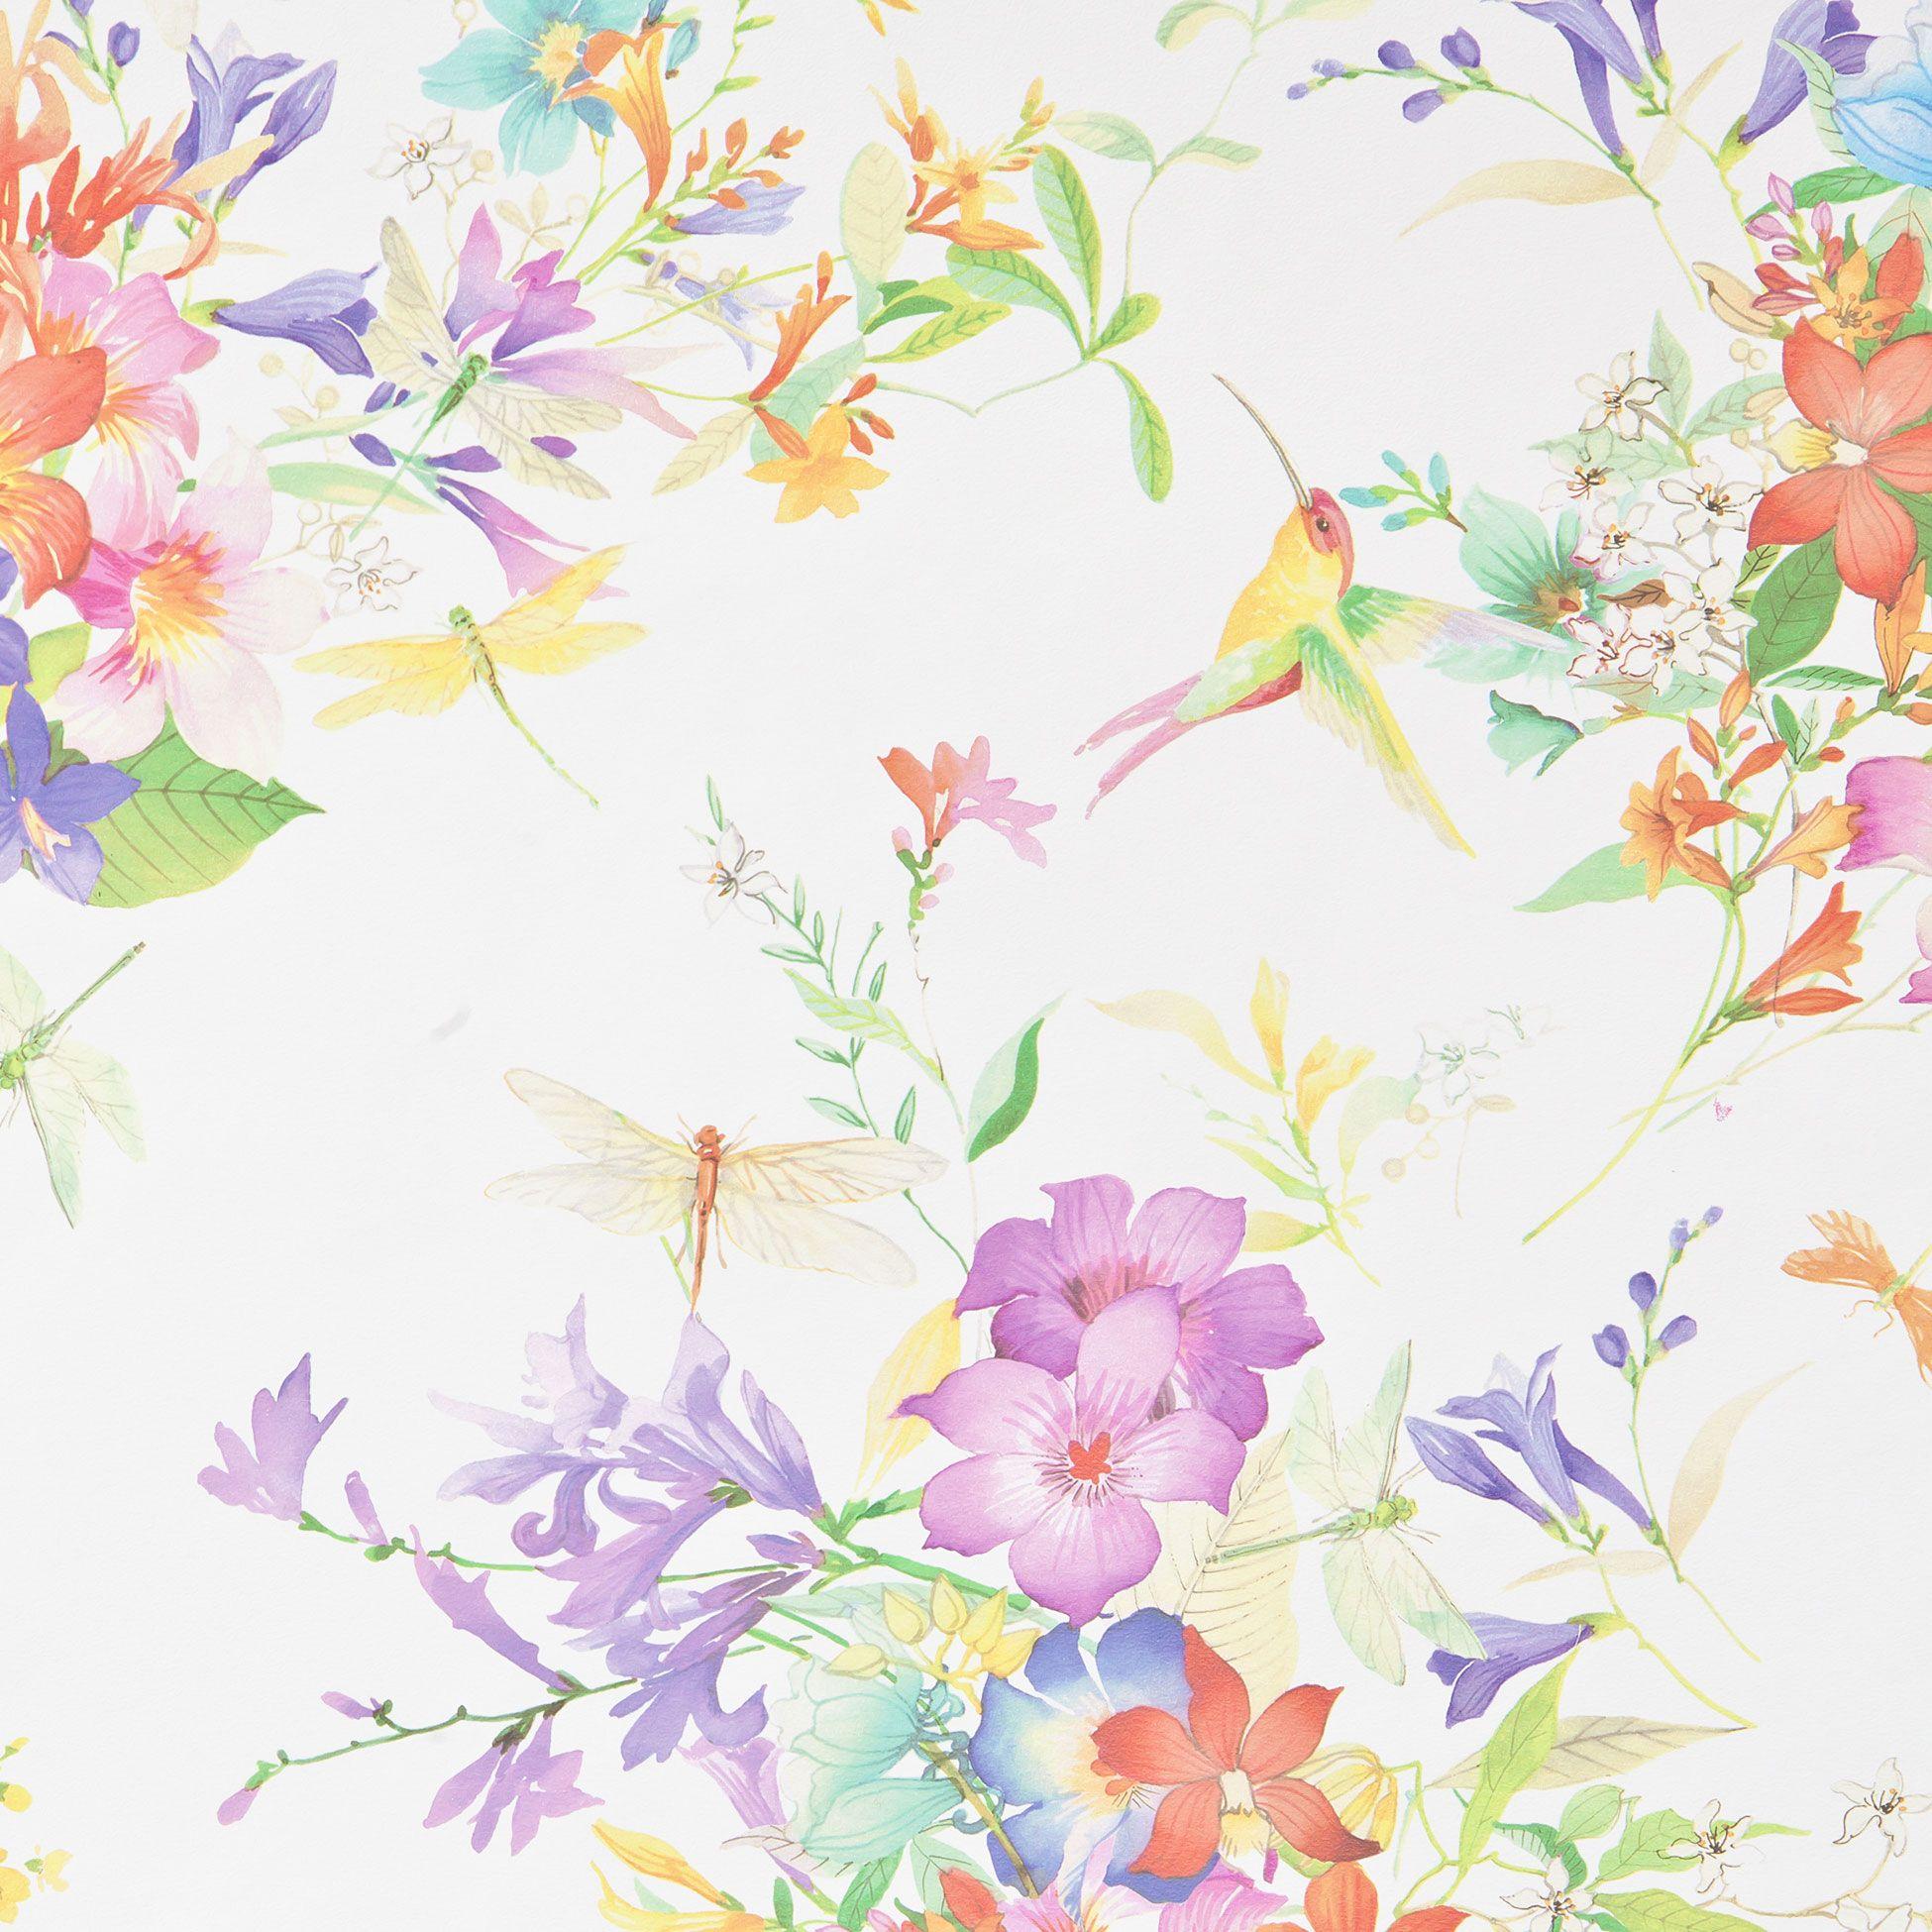 Hummingbird wallpaper zara home hummingbird wallpaper for Wallpaper zara home